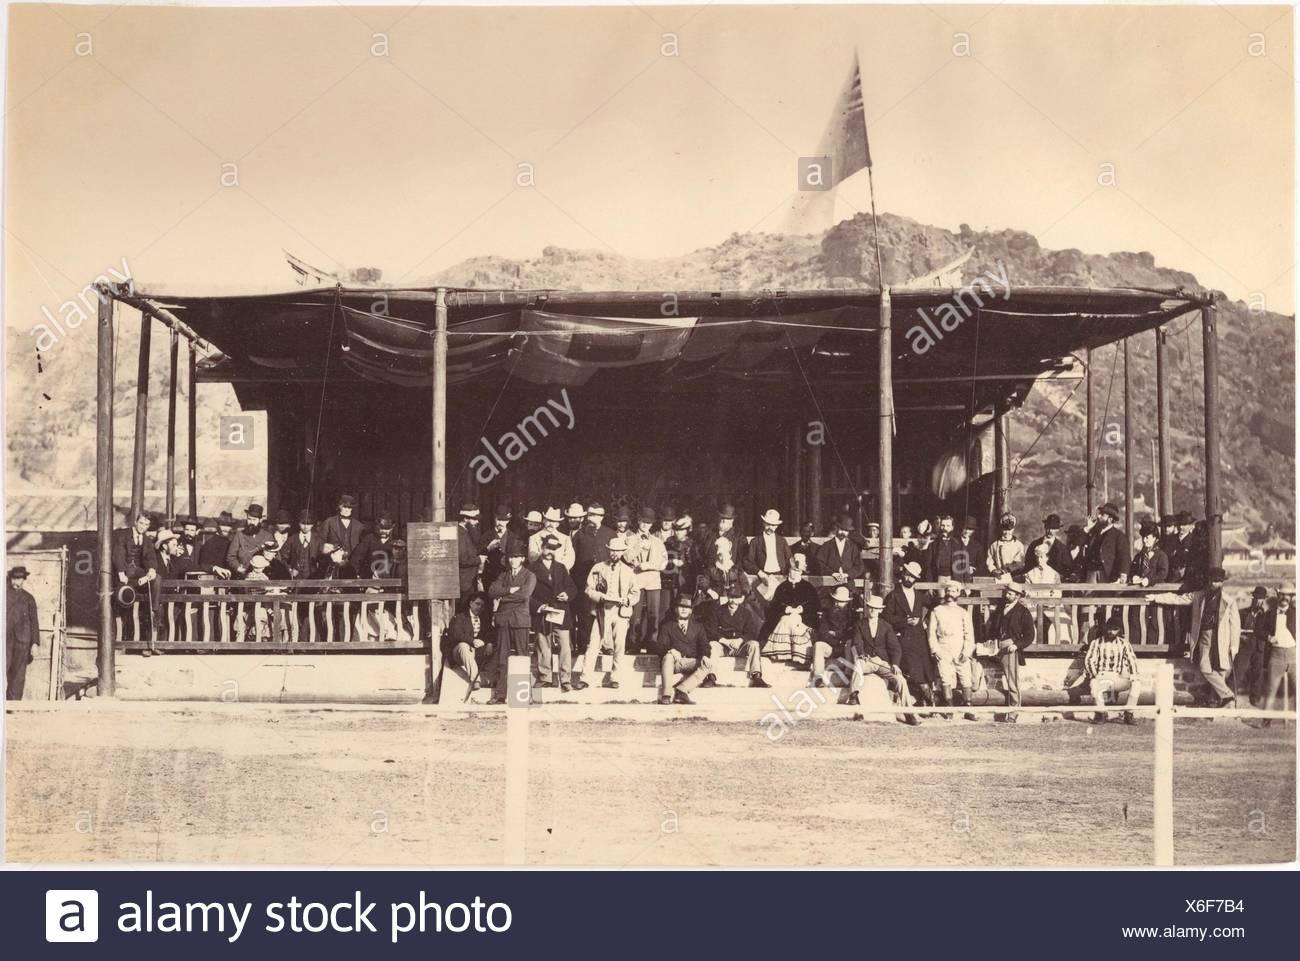 The Grand Stand, Amoy 1871. Artist: Attributed to John Thomson (British, Edinburgh, Scotland 1837-1921 London); Date: 1871; Medium: Albumen silver - Stock Image